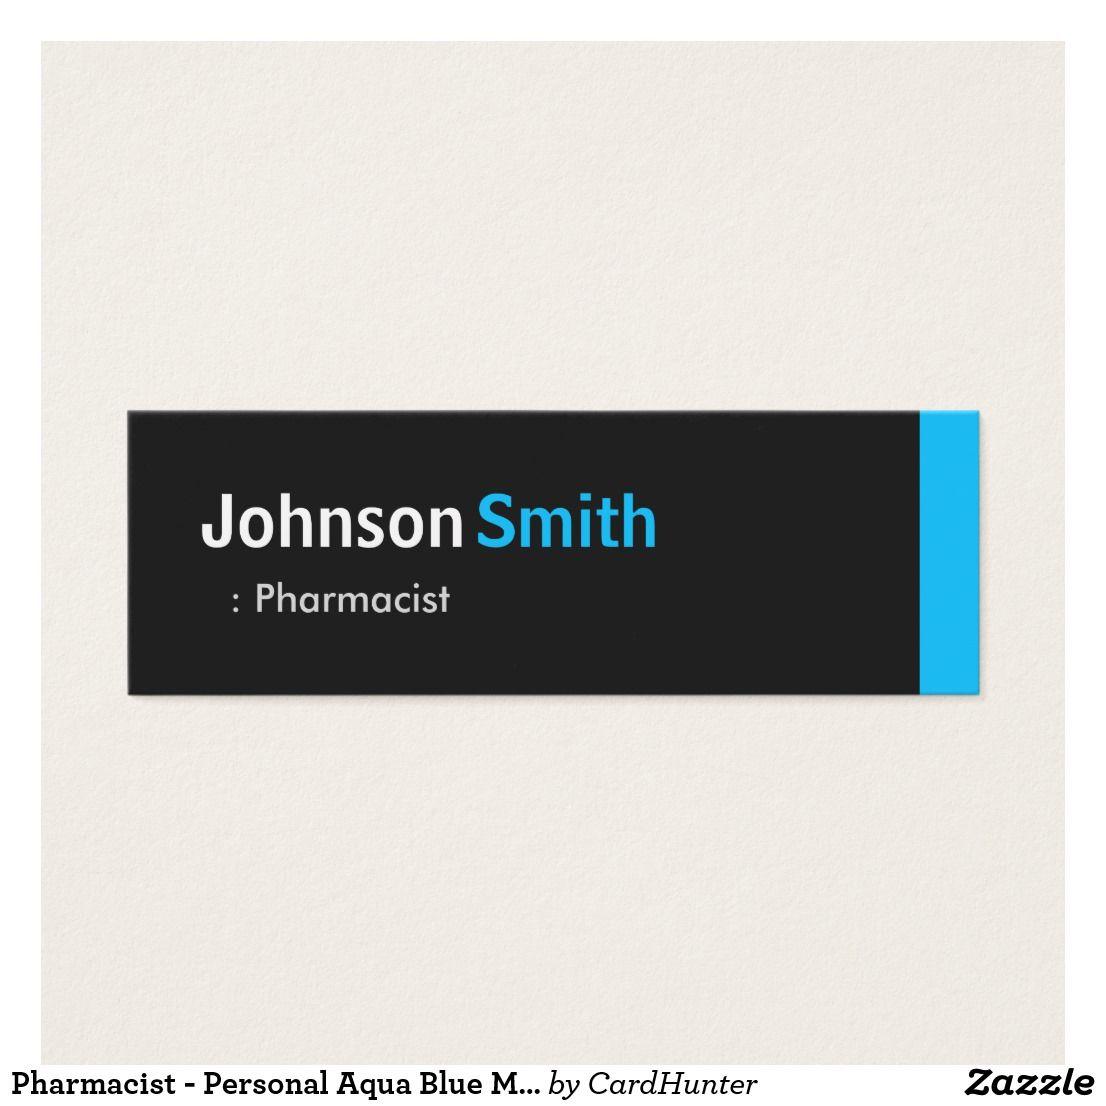 Pharmacist - Personal Aqua Blue Mini Mini Business Card | job ...